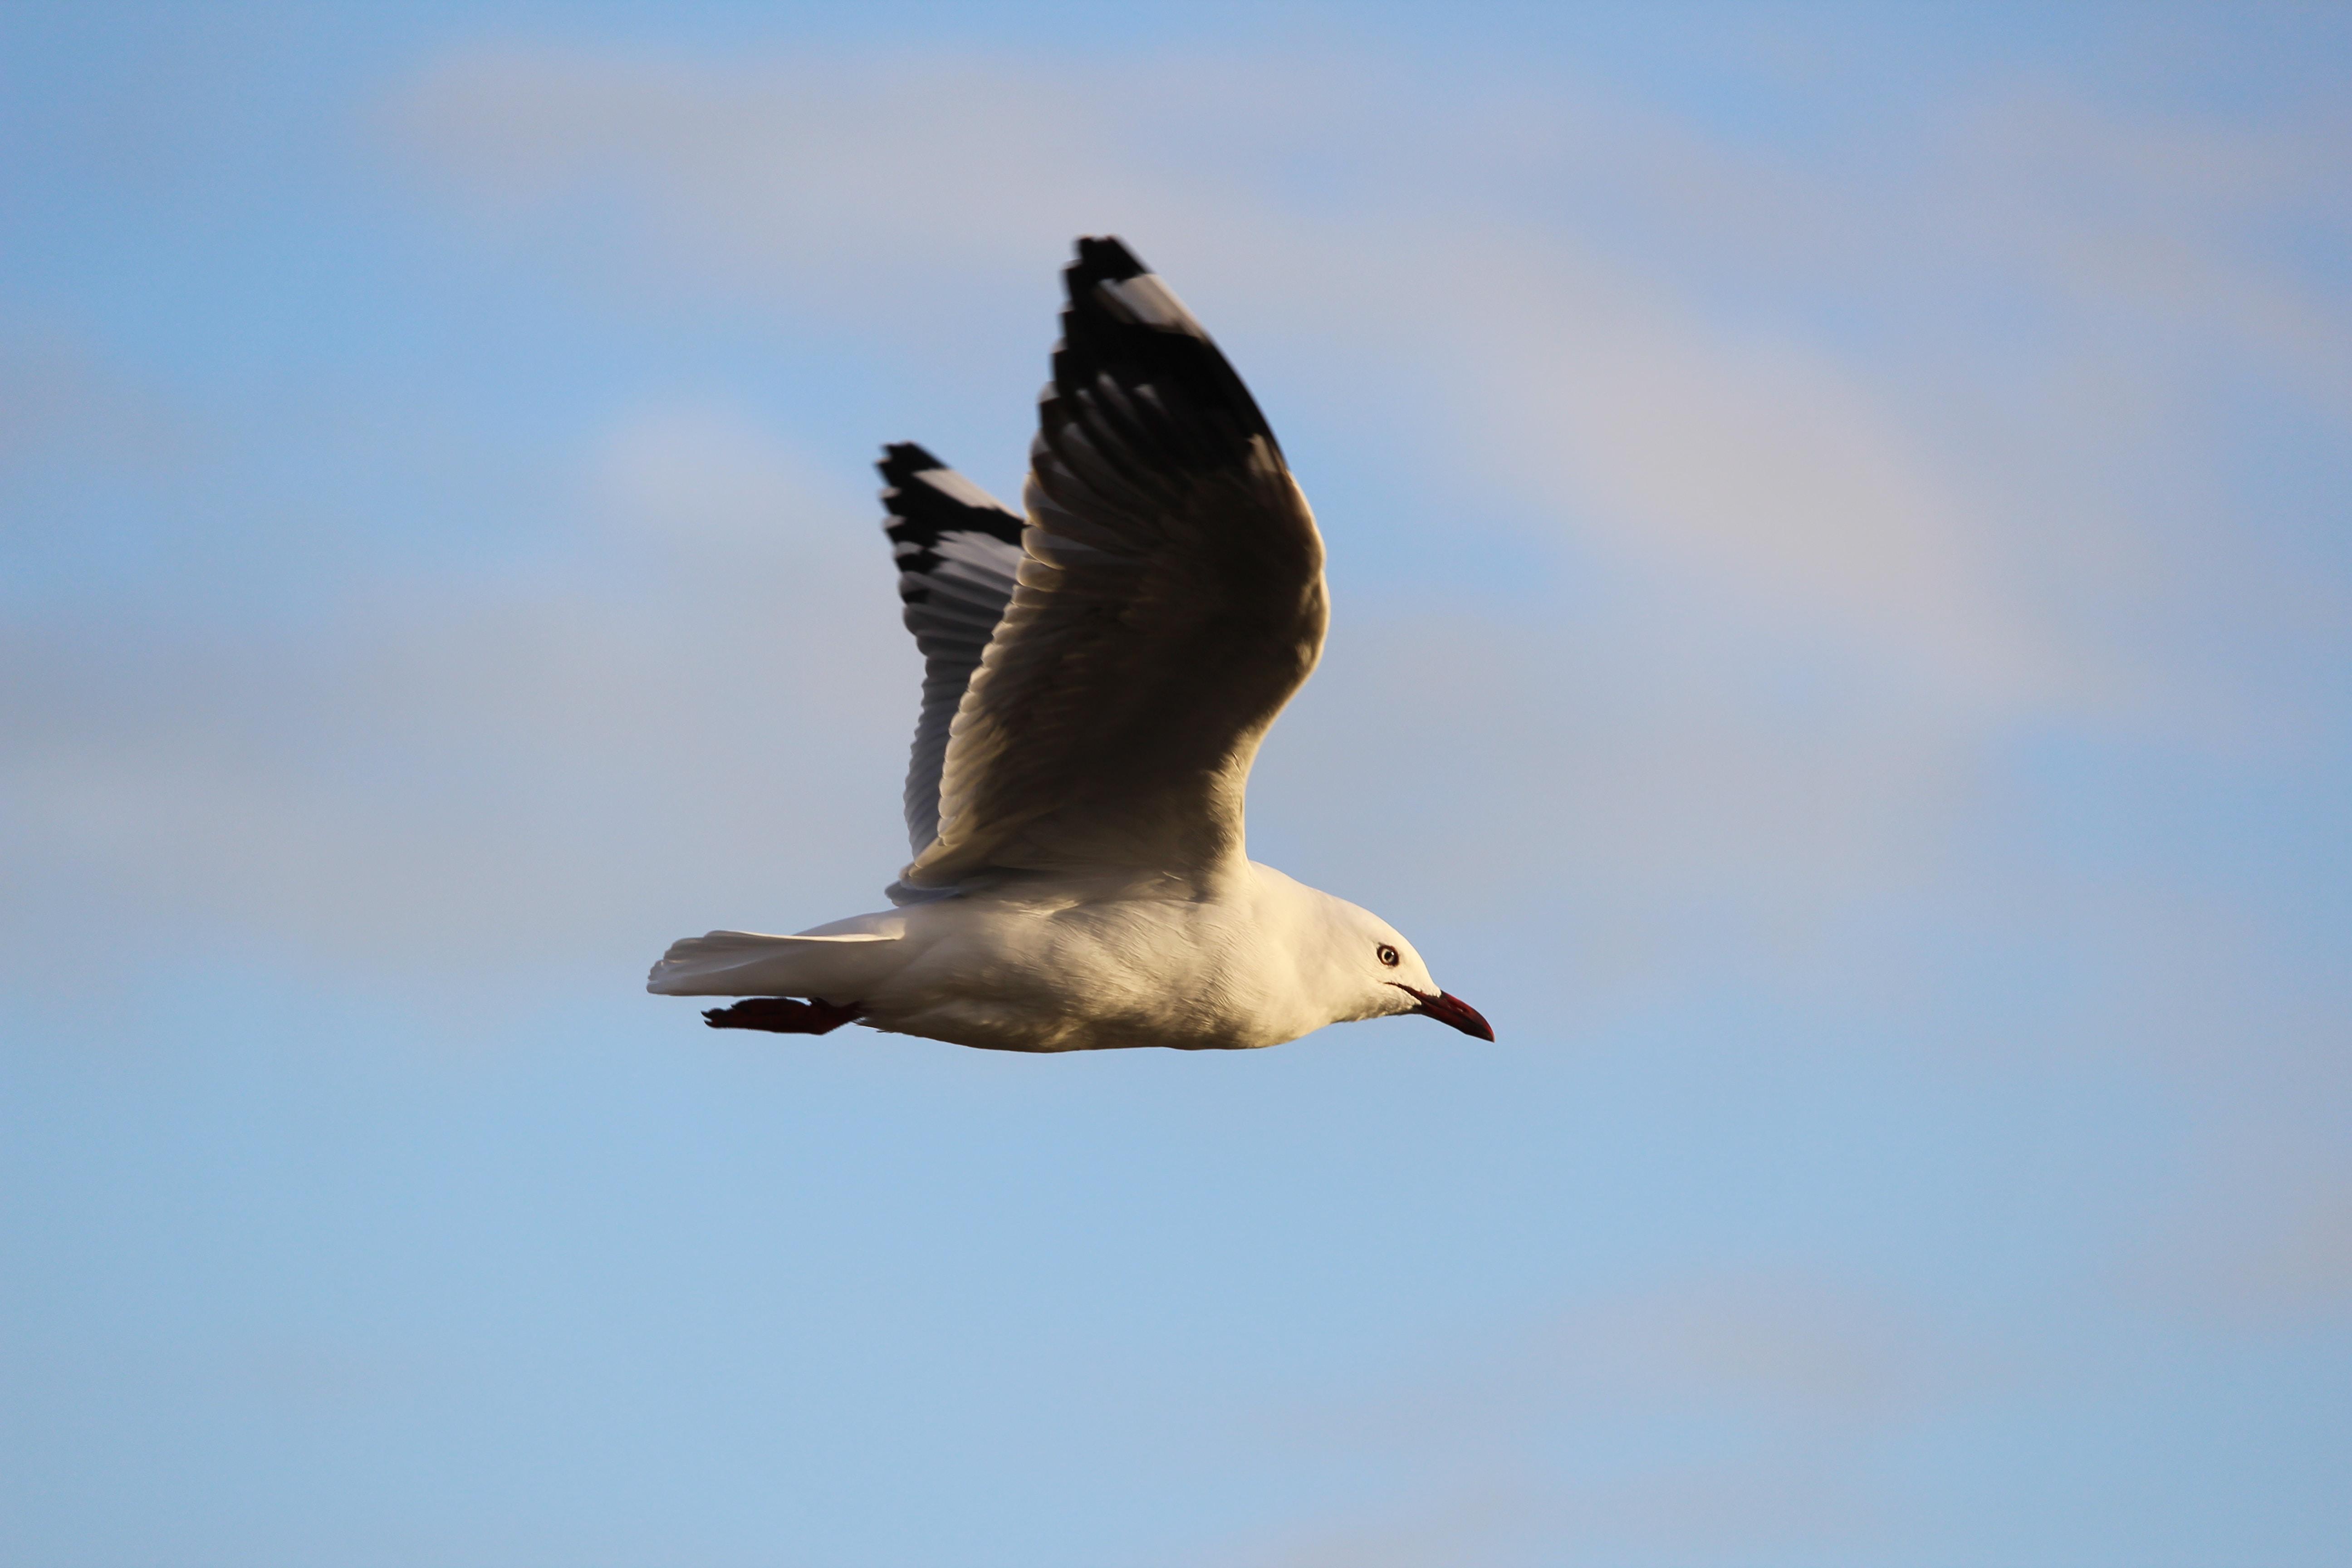 Seagull in mid-flight at Piha Beach